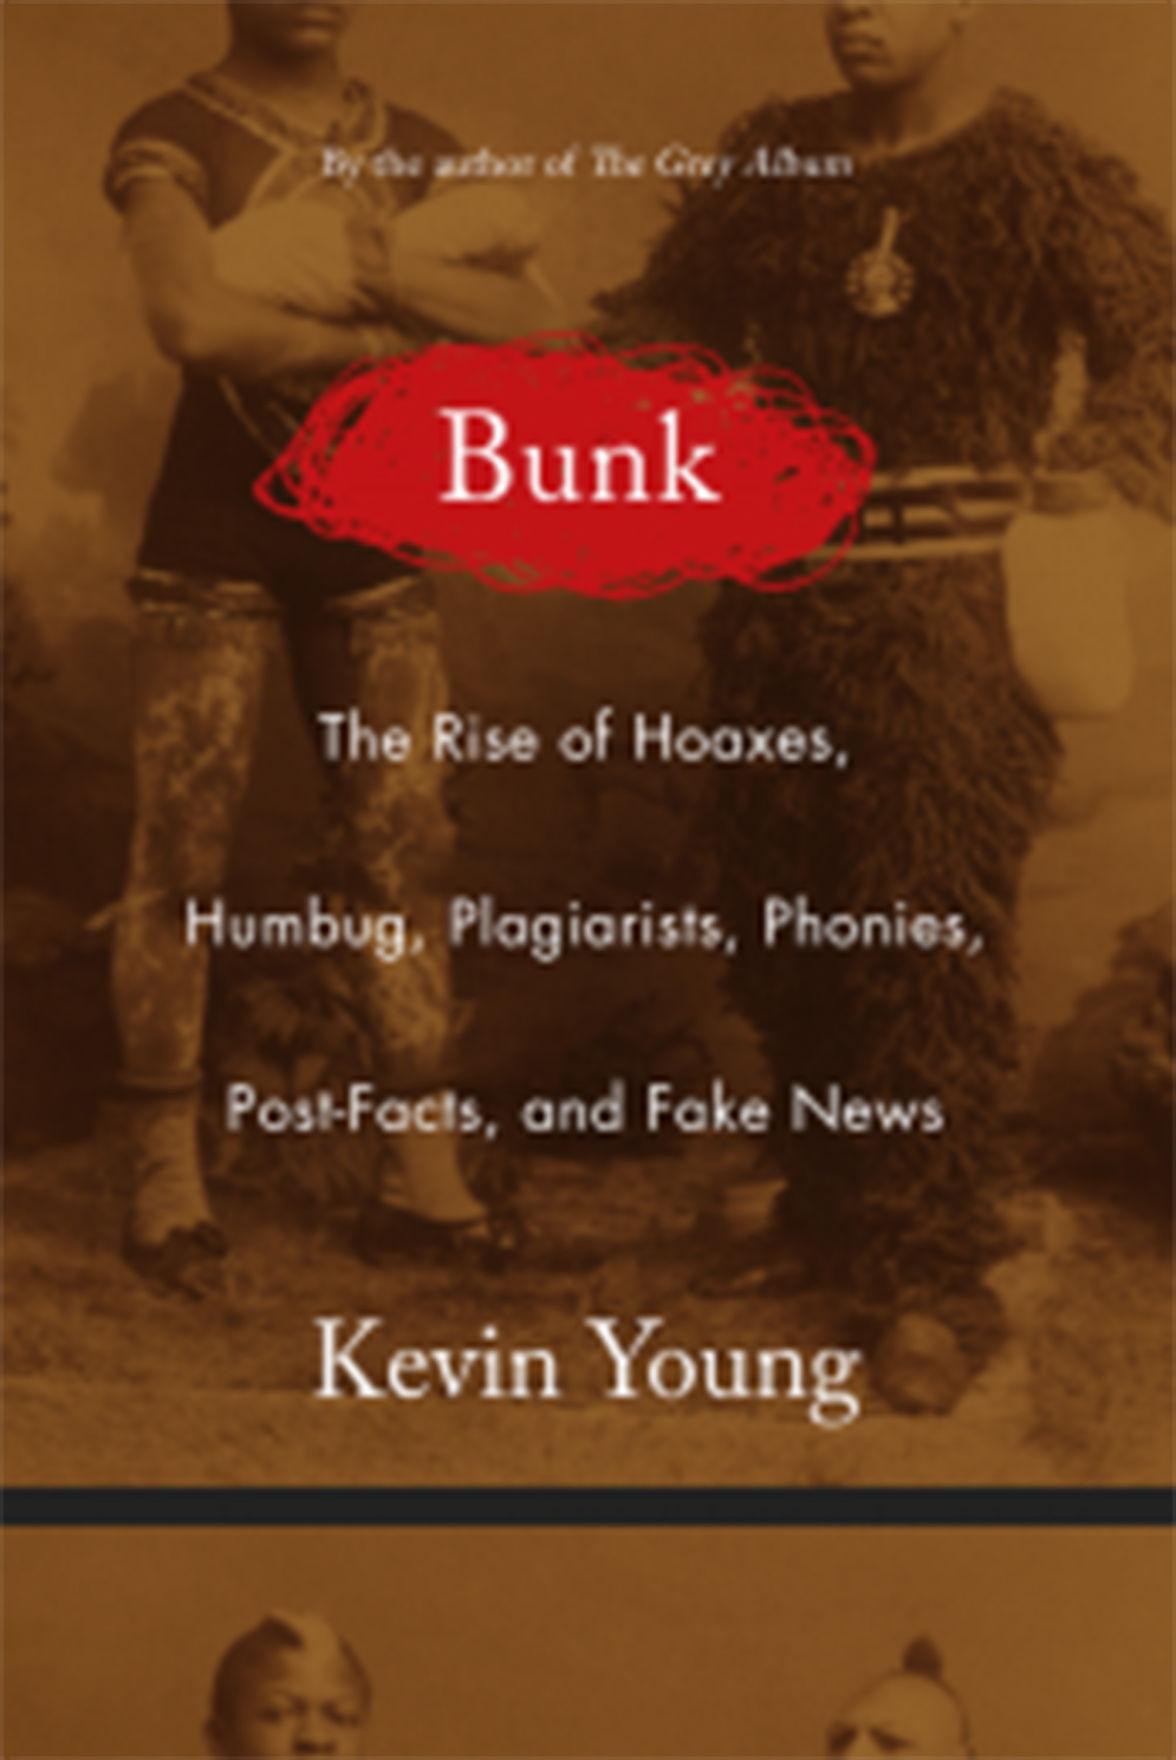 BOOKS BOOK-BUNK-YOUNG SE